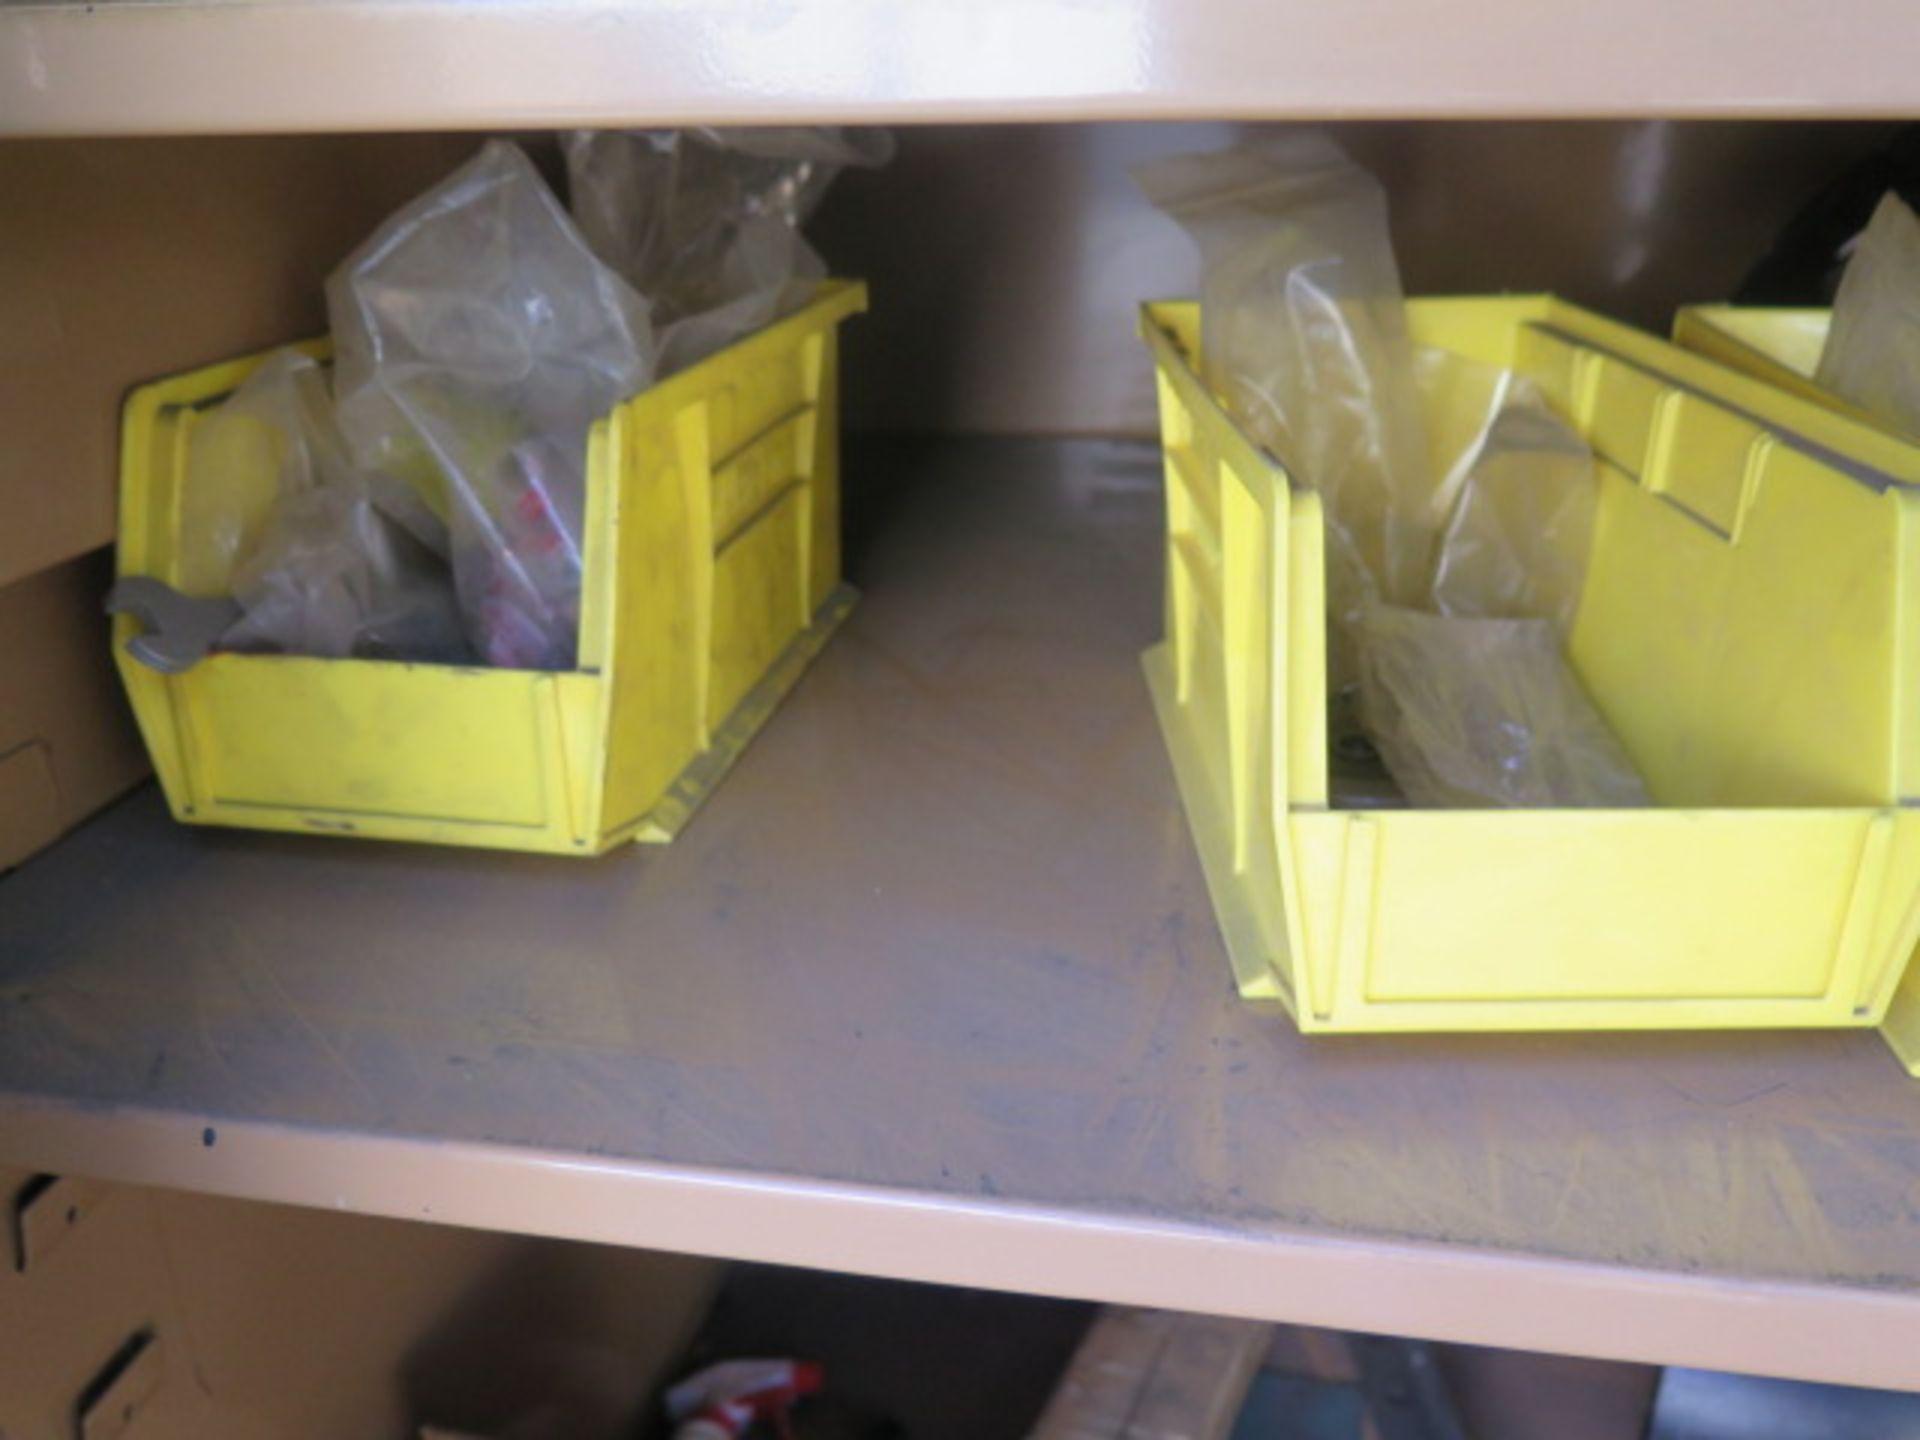 Knaack mdl. 139 Jobmaster Job Box (SOLD AS-IS - NO WARRANTY) - Image 9 of 17